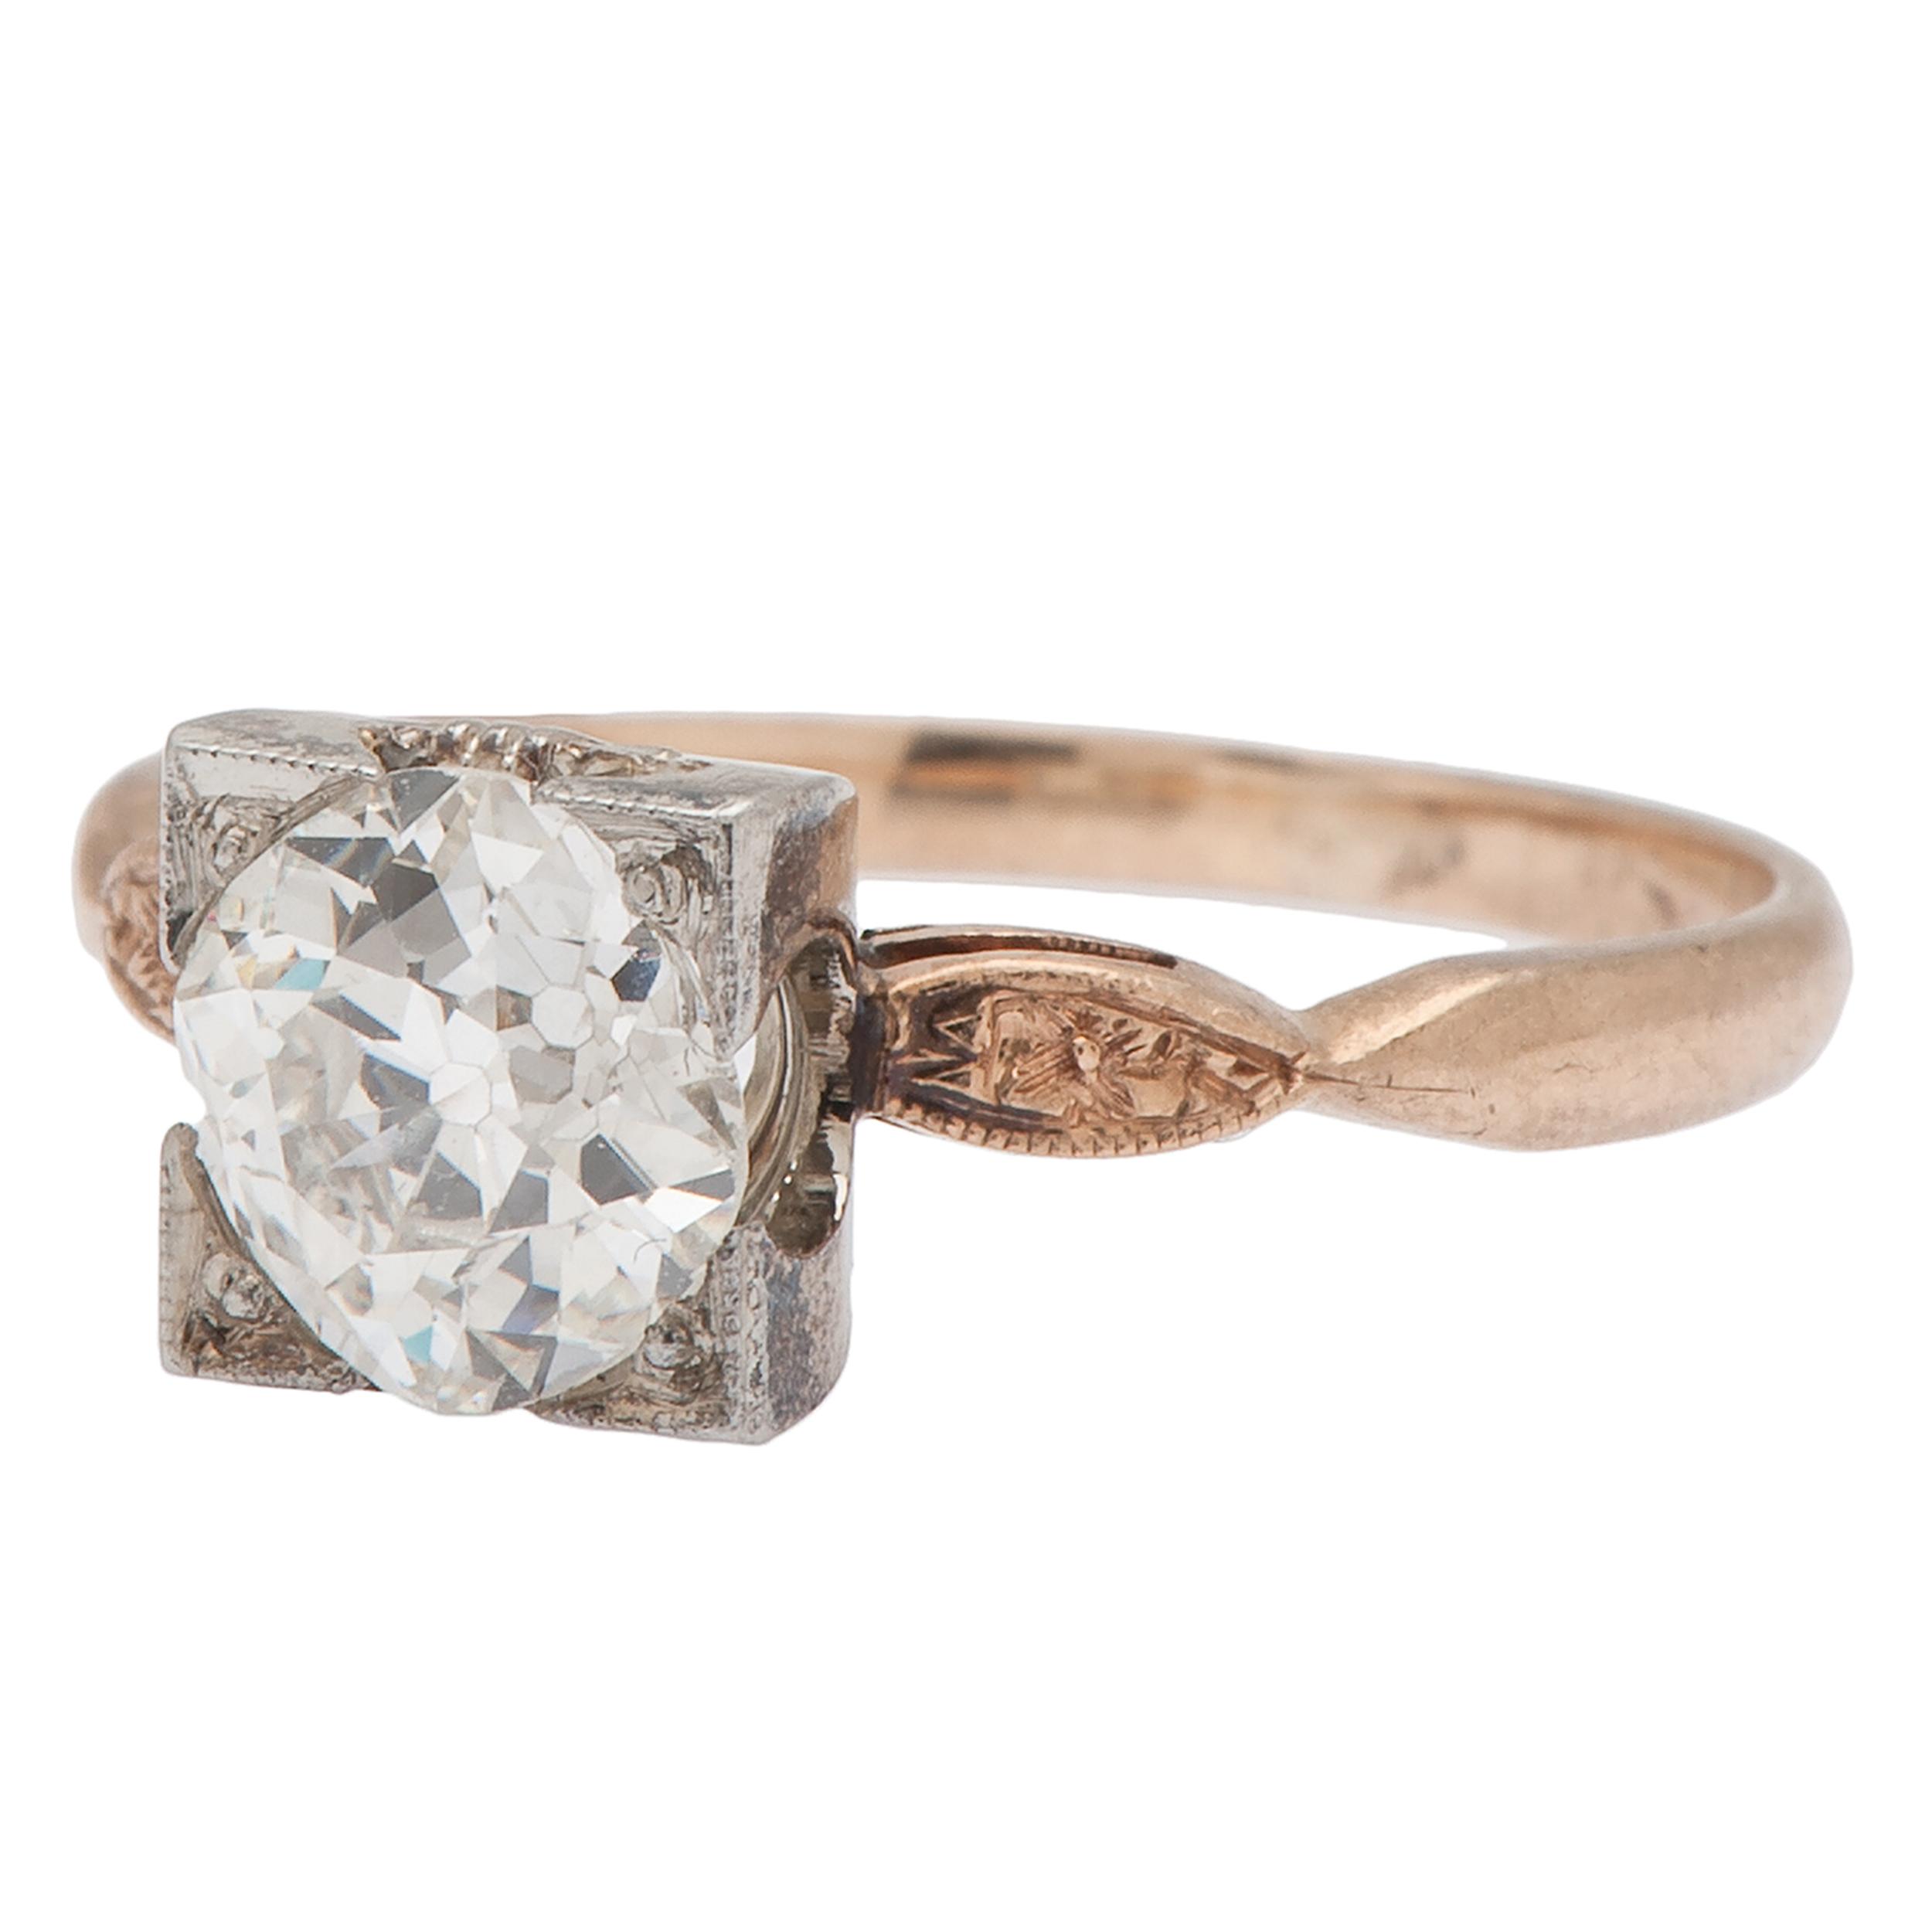 Old Mine Cut Diamond Engagement Ring In Karat Gold  Cowan. Art Nouveau Engagement Rings. Magnesium Wedding Rings. Raw Cut Diamond Wedding Rings. Basket Wedding Rings. Loop Rings. $70000 Wedding Rings. Head Engagement Rings. Girlfriend Rings